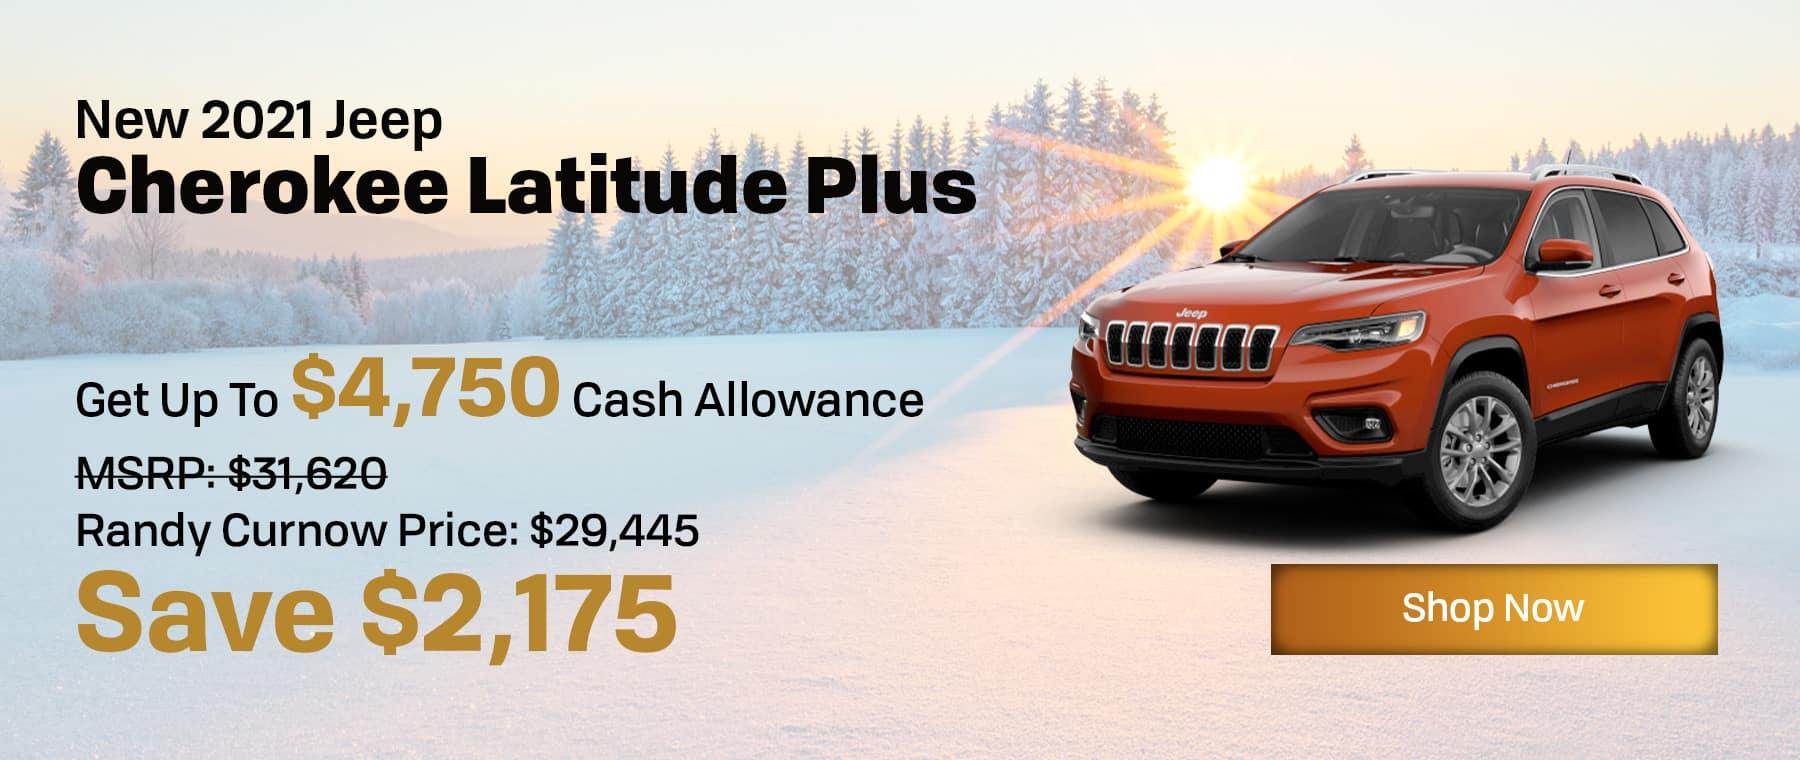 New 2021 Jeep Cherokee Latitude Plus_jan-2021